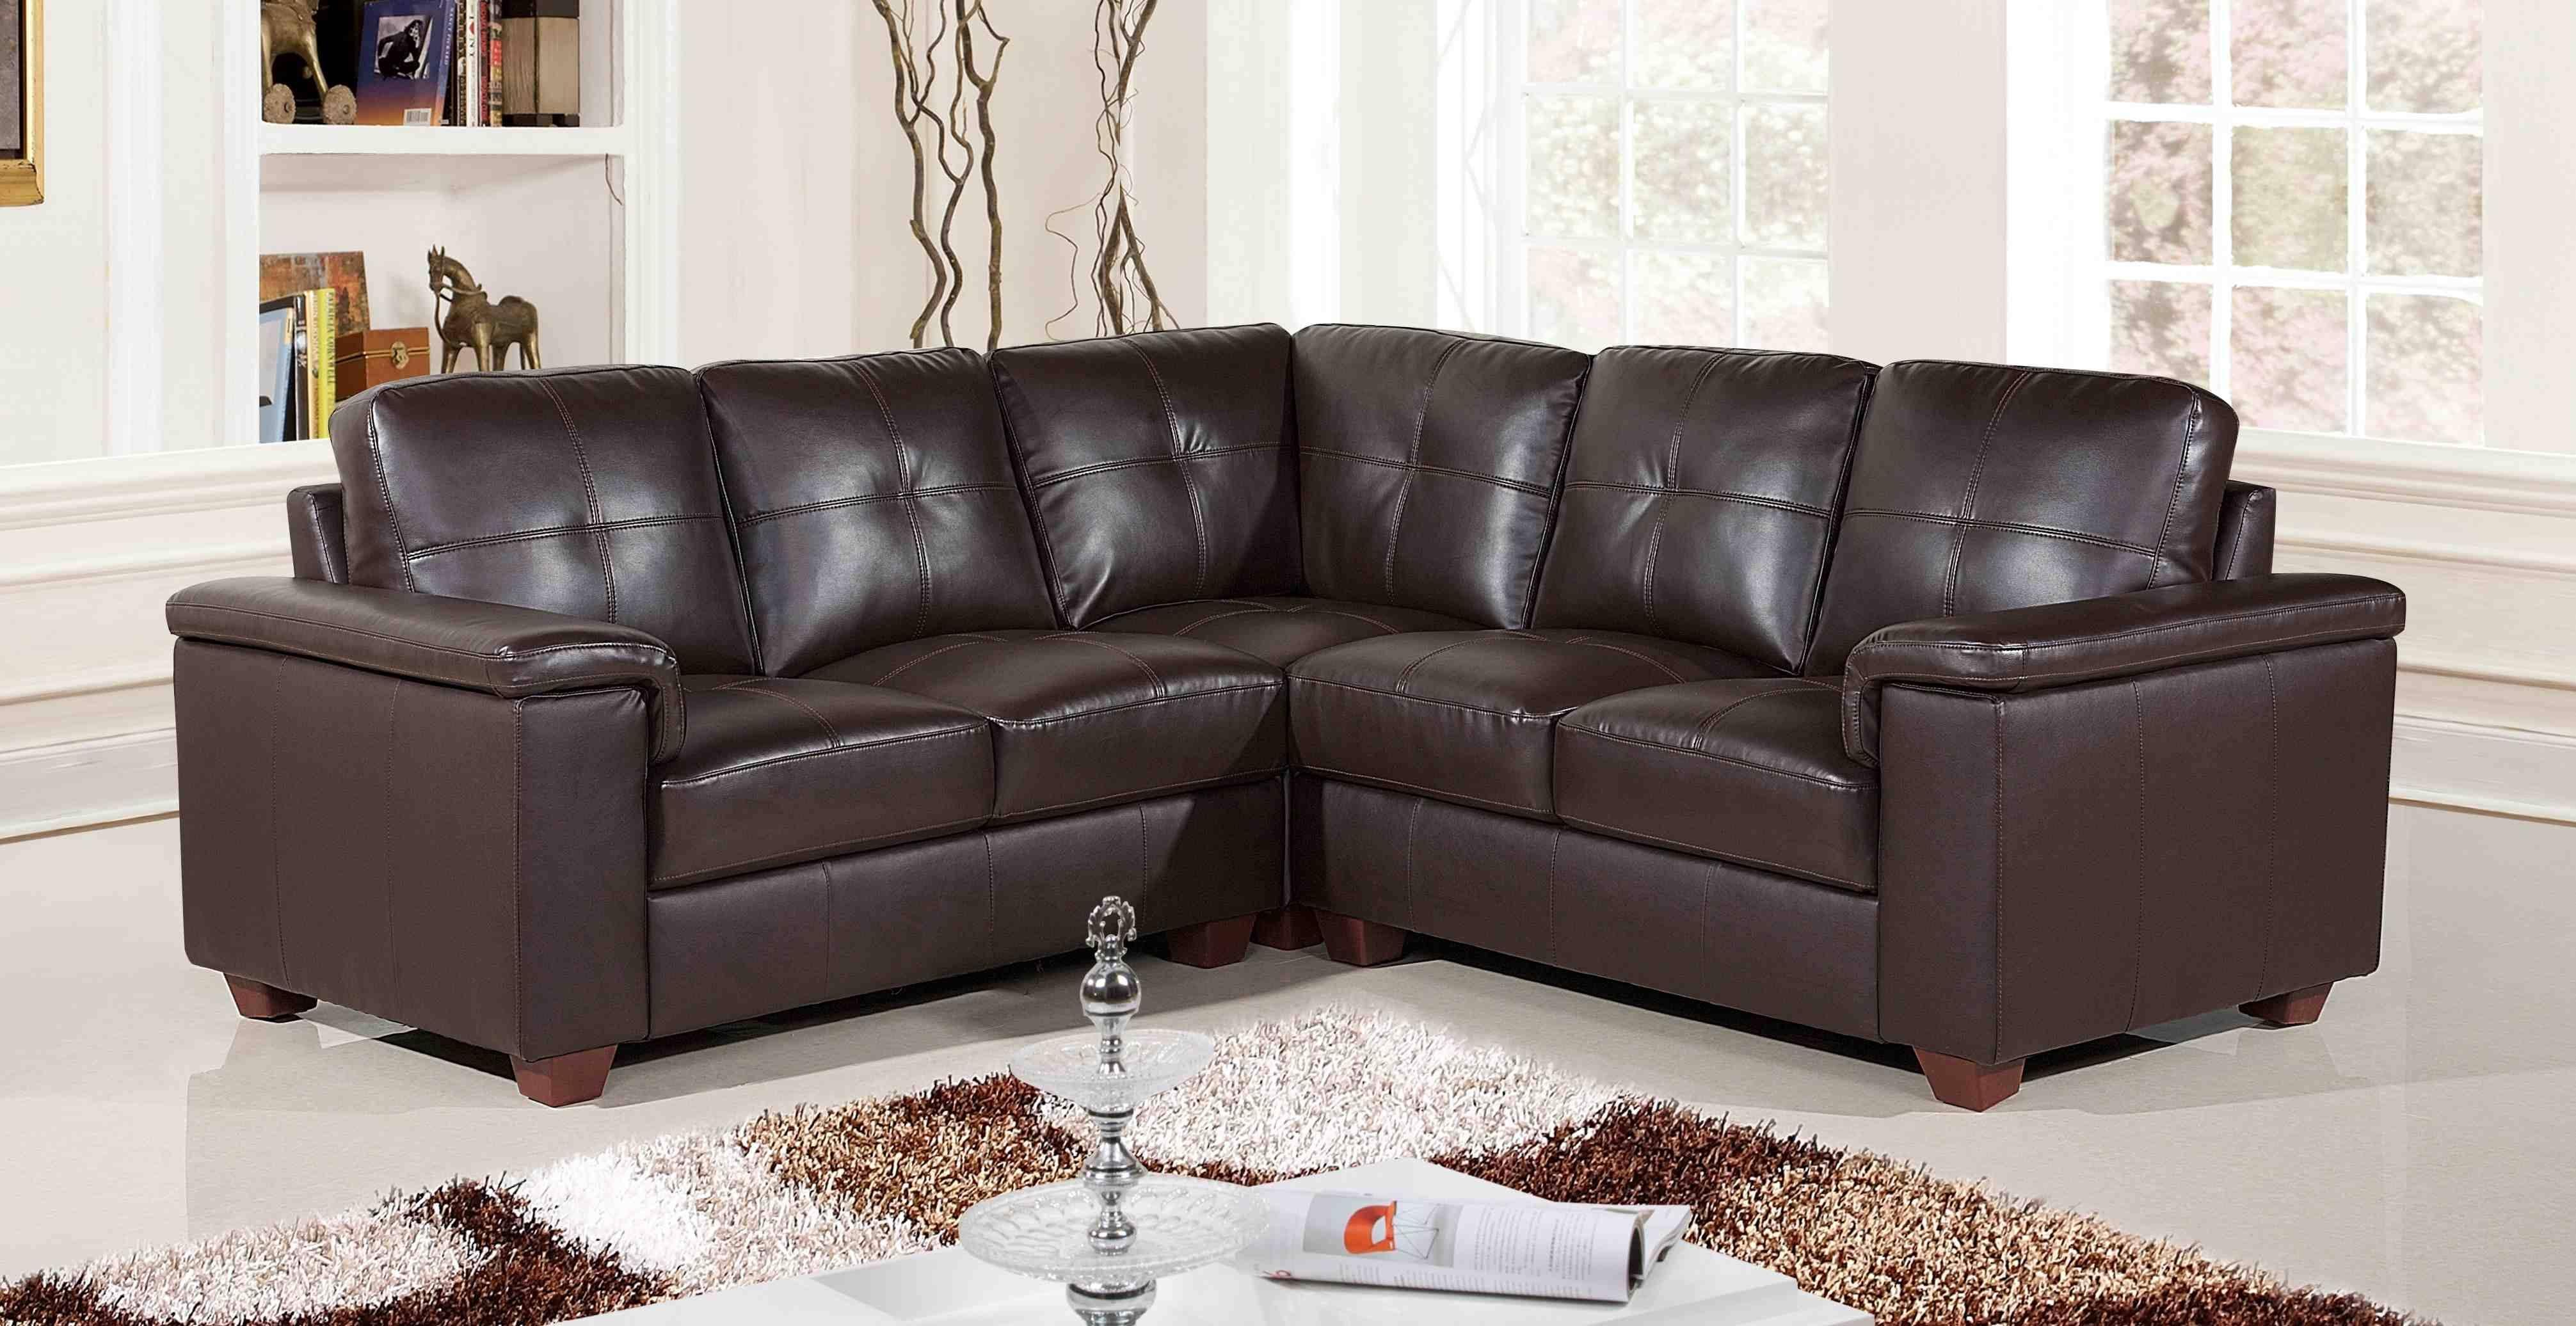 Cheapest Black Leather Corner Sofa | Centerfieldbar throughout Black Leather Corner Sofas (Image 4 of 15)